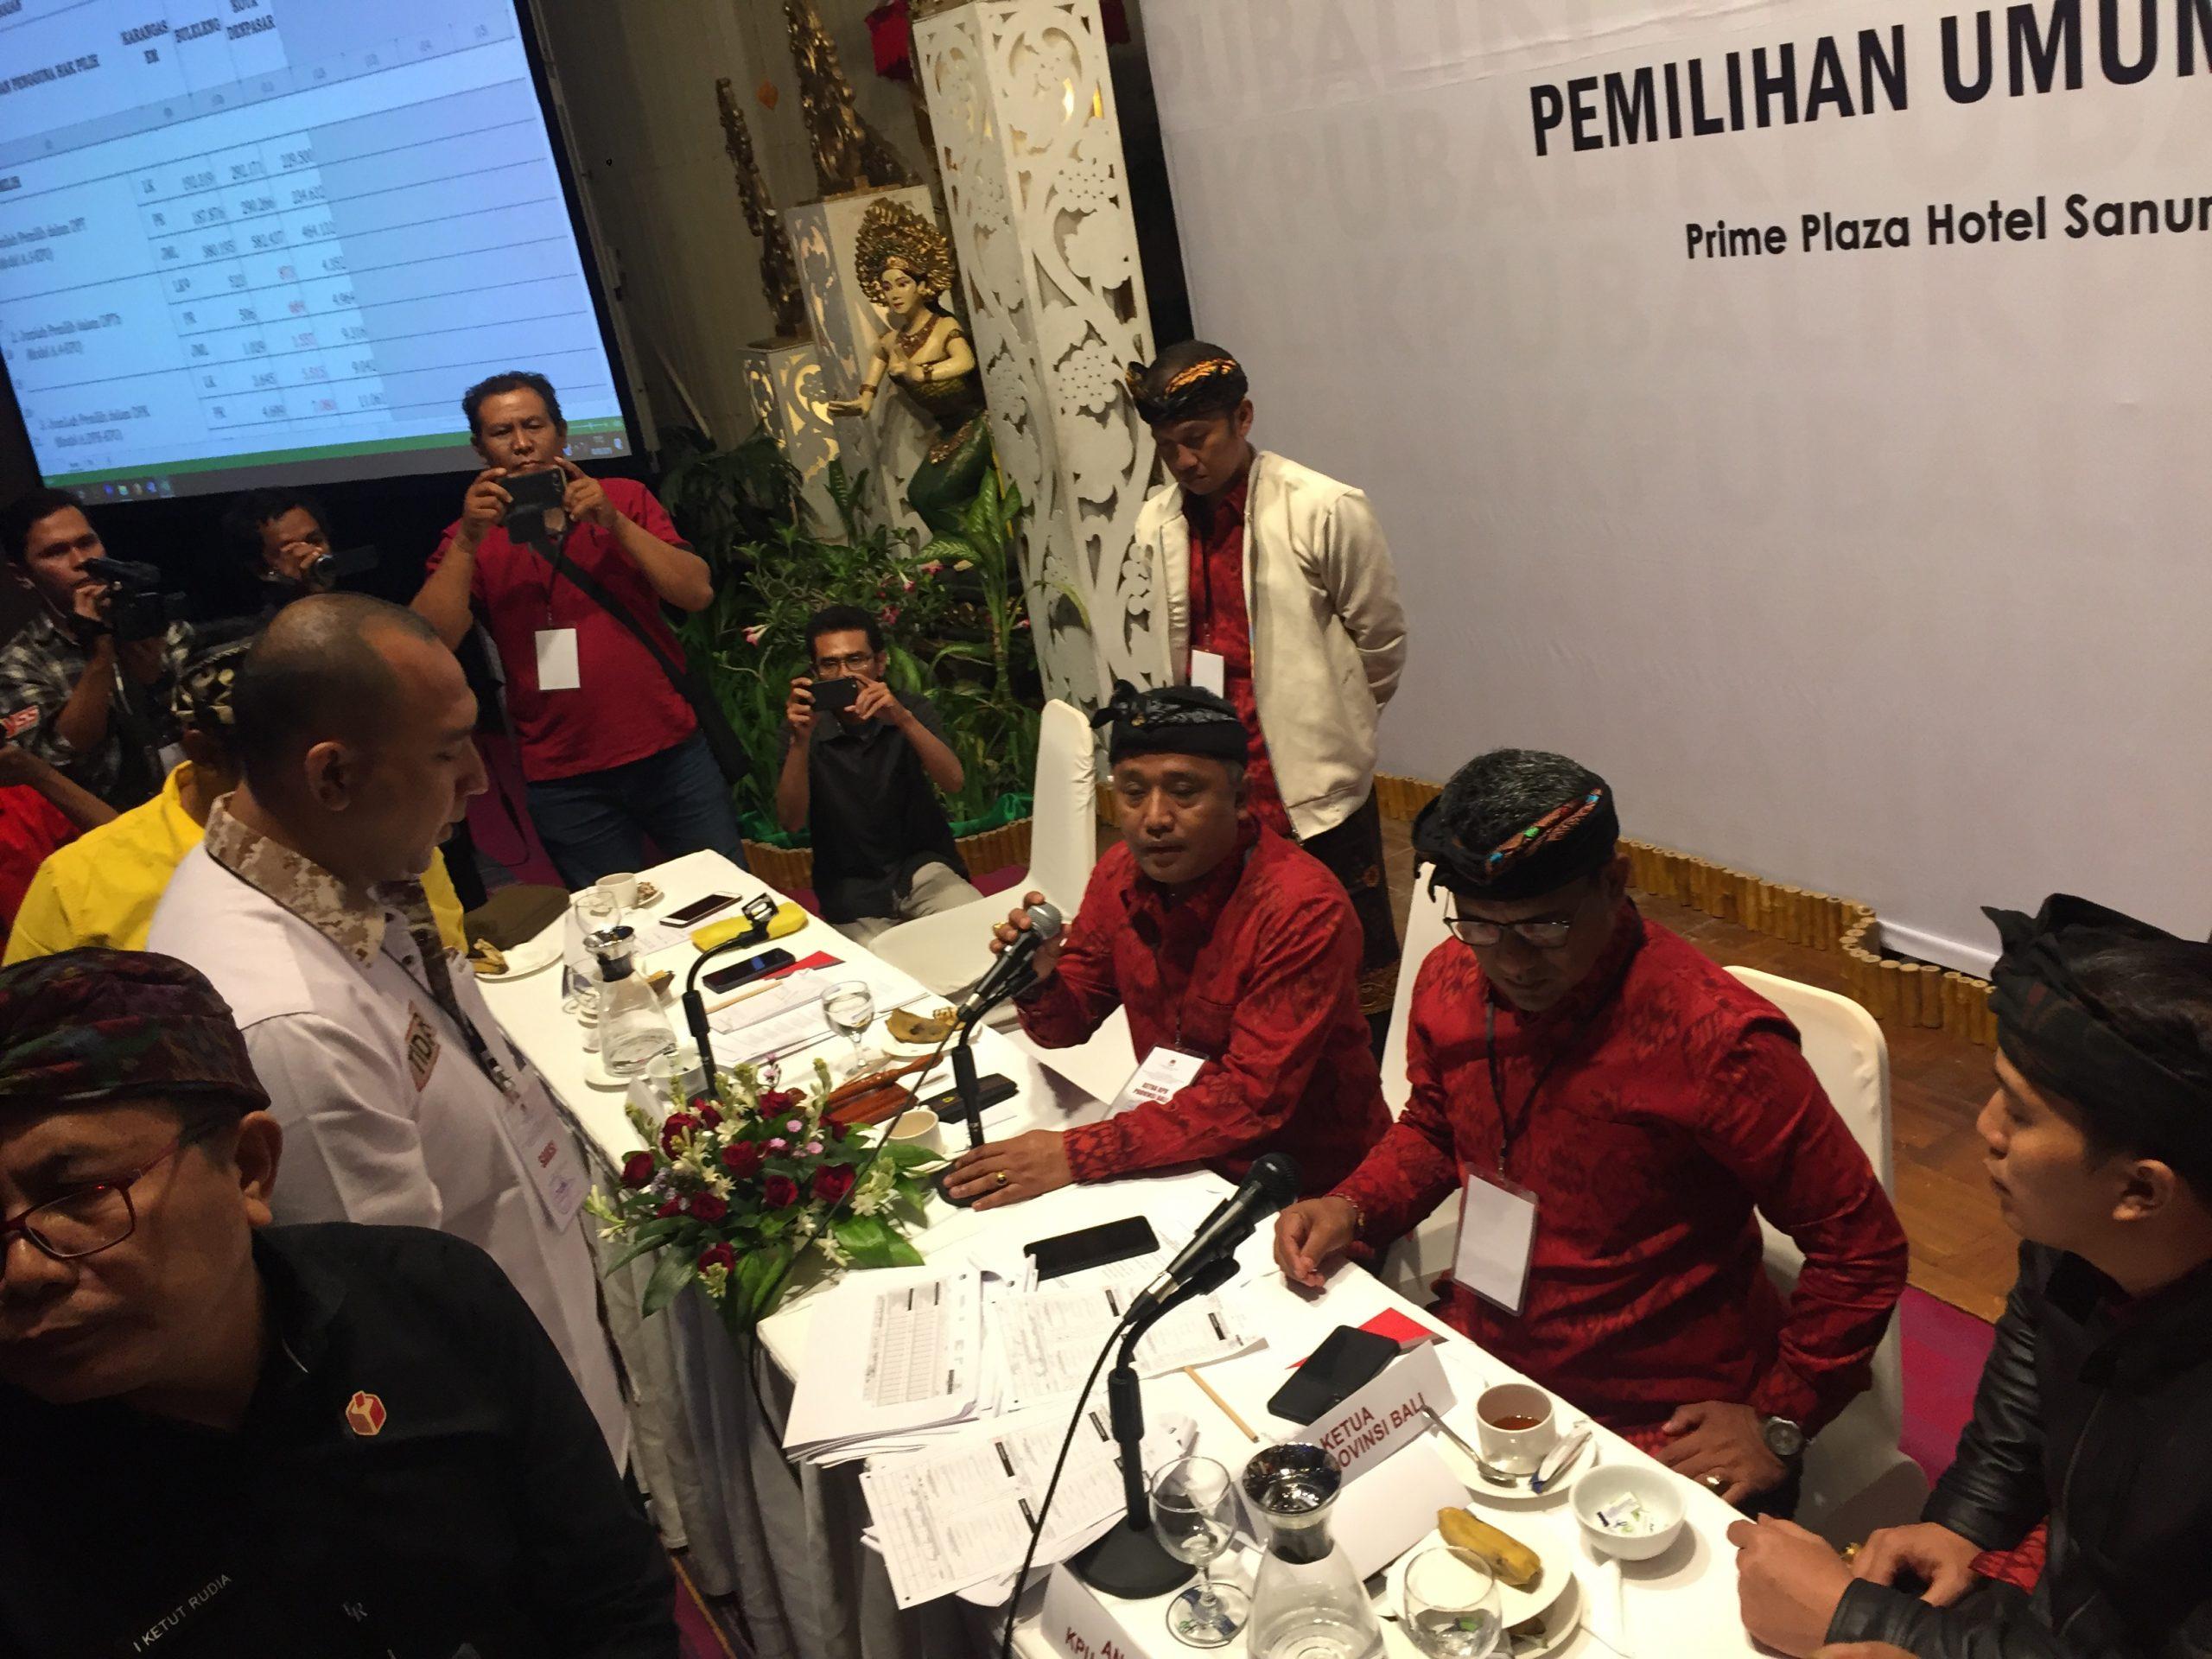 SUASANA rapat pleno penghitungan suara hasil pemilu 2019 oleh KPU Bali yang sempat tegang, karena saksi salah satu parpol menilai penyelenggara pemilu kurang profesional dalam proses penghitungan suara di salah satu TPS di Karangasem. Foto: gus hendra